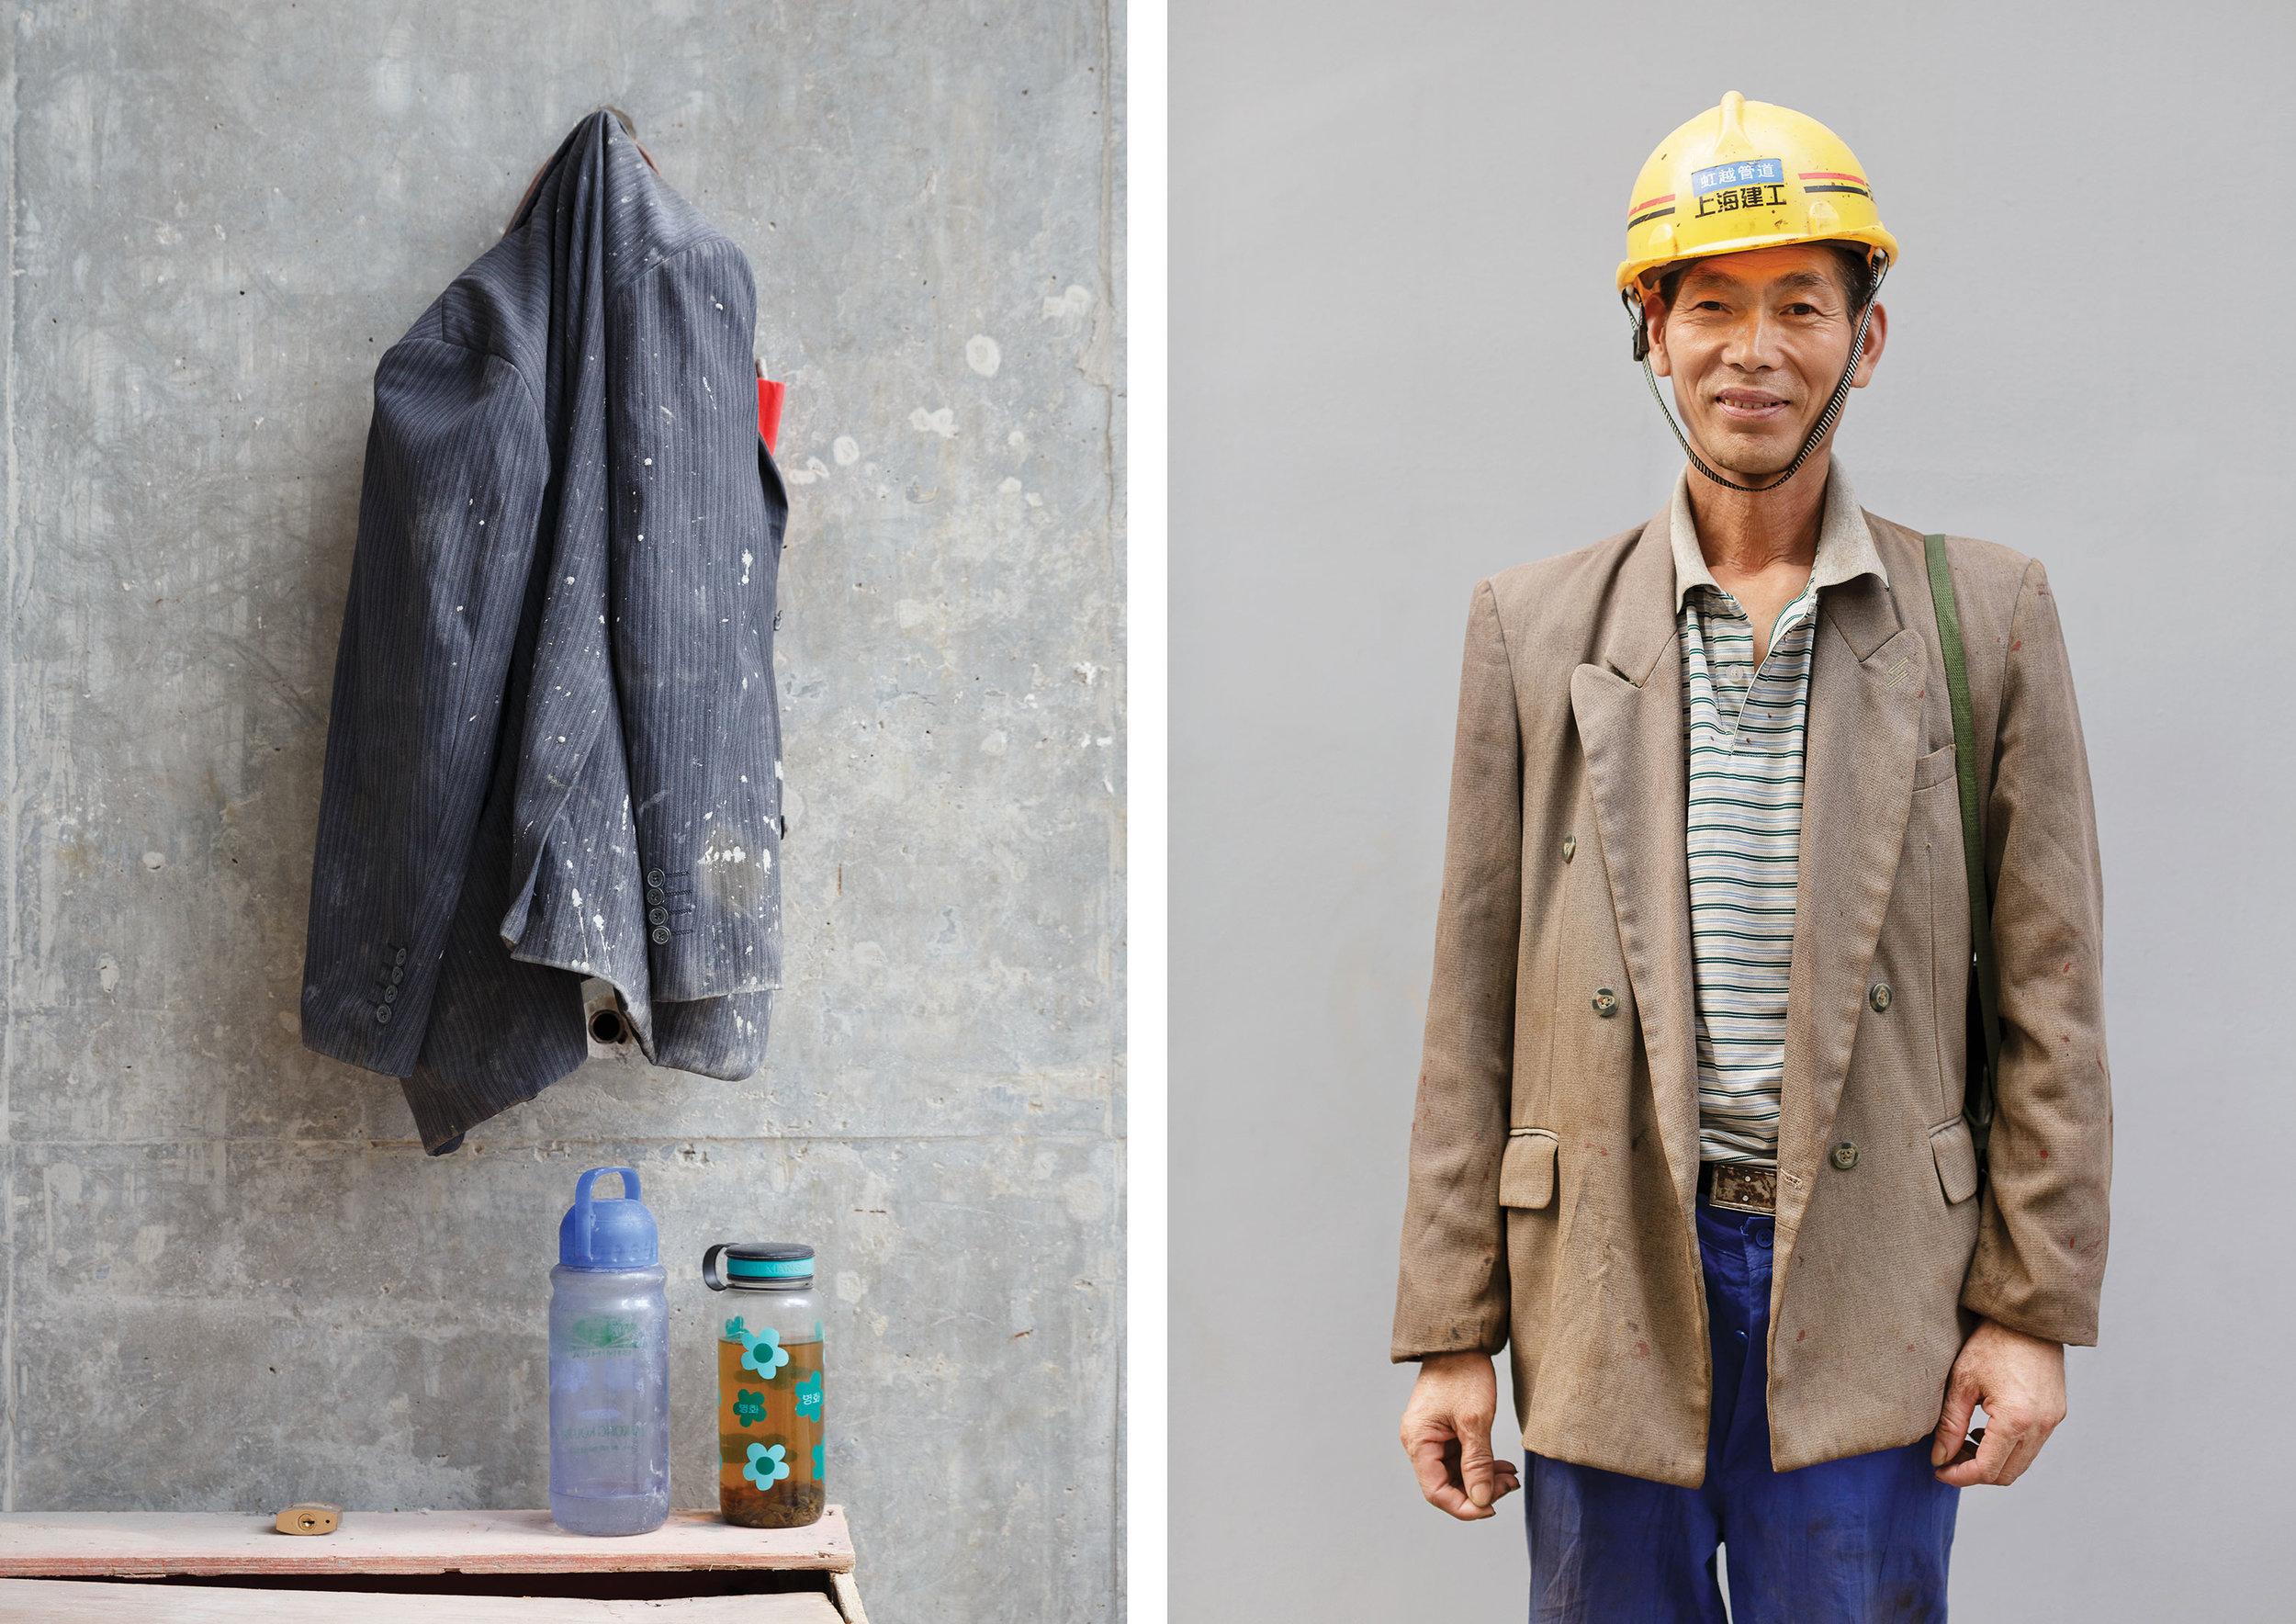 Shanghai_Tower-workers-and-building3.jpg